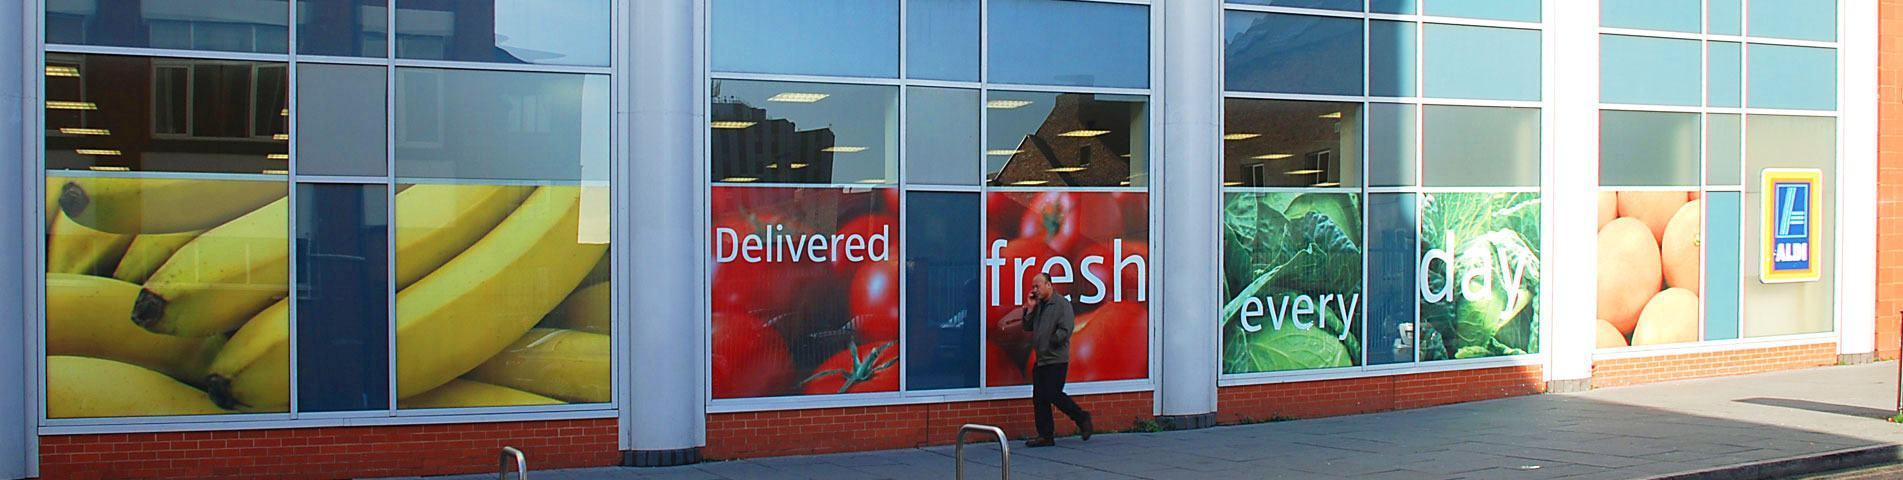 shopfronts-nottingham